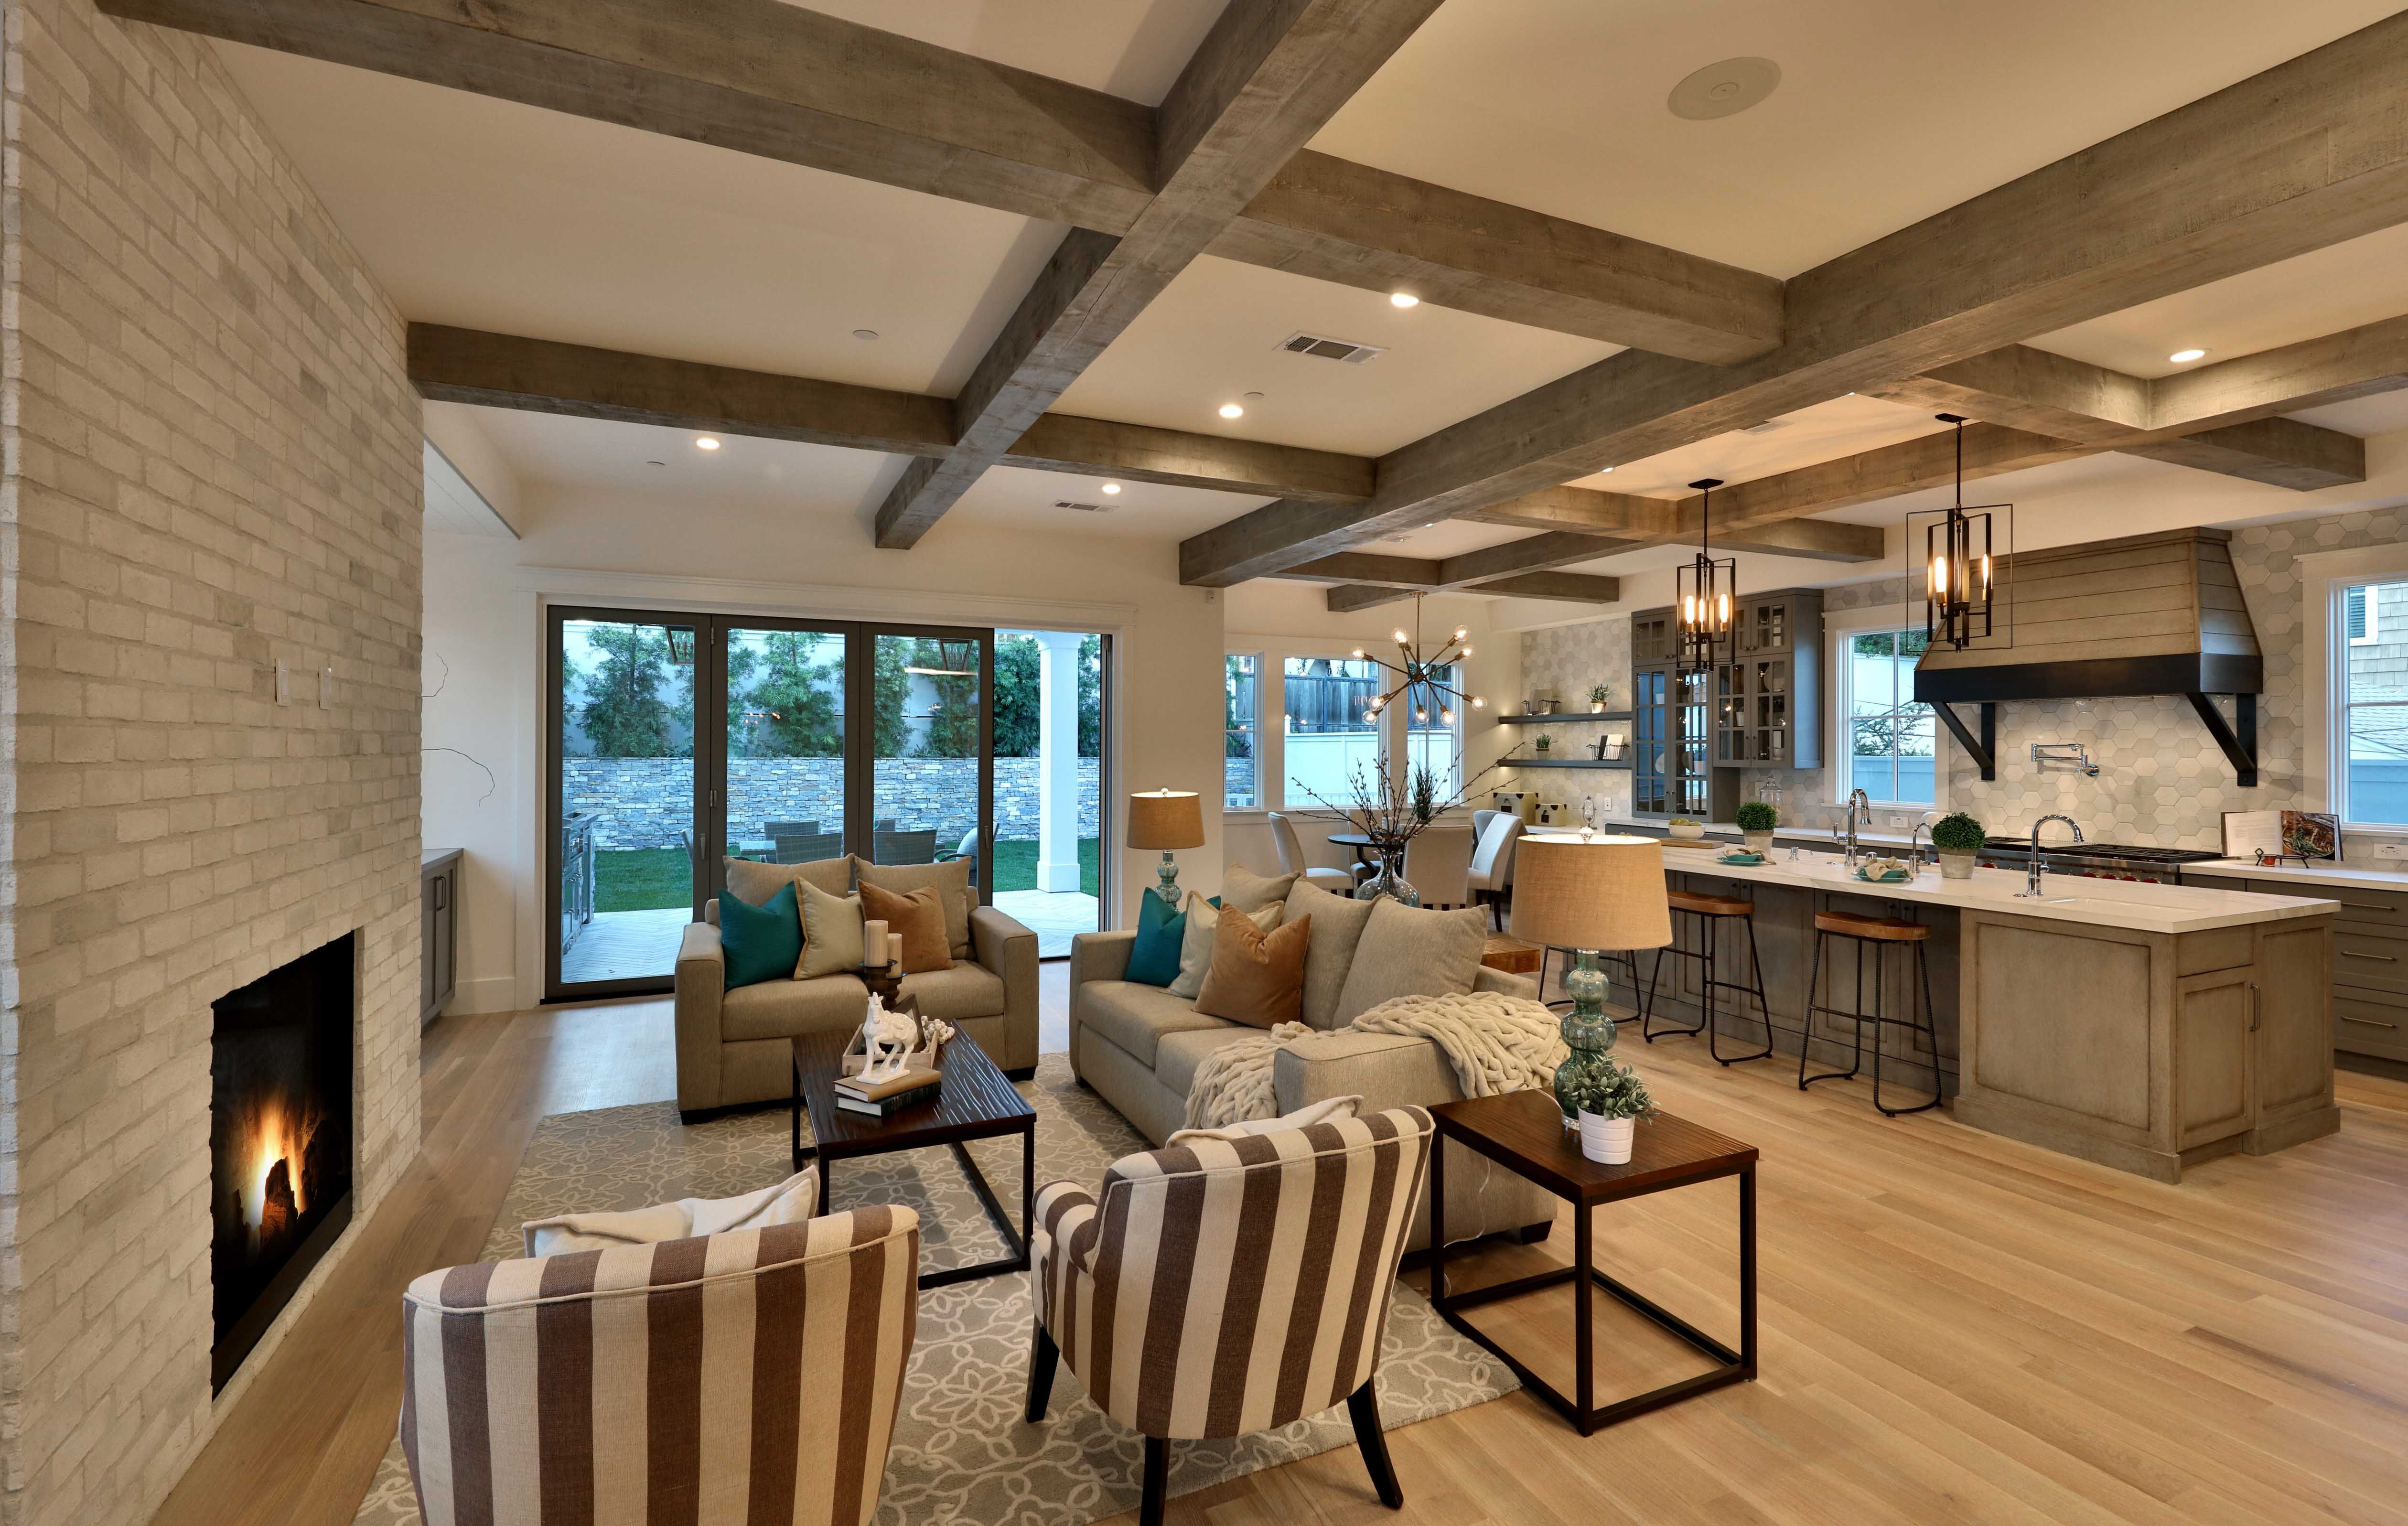 Rustic Open Concept Luxury Home Open Concept Floor Plans Open Concept Luxury Homes